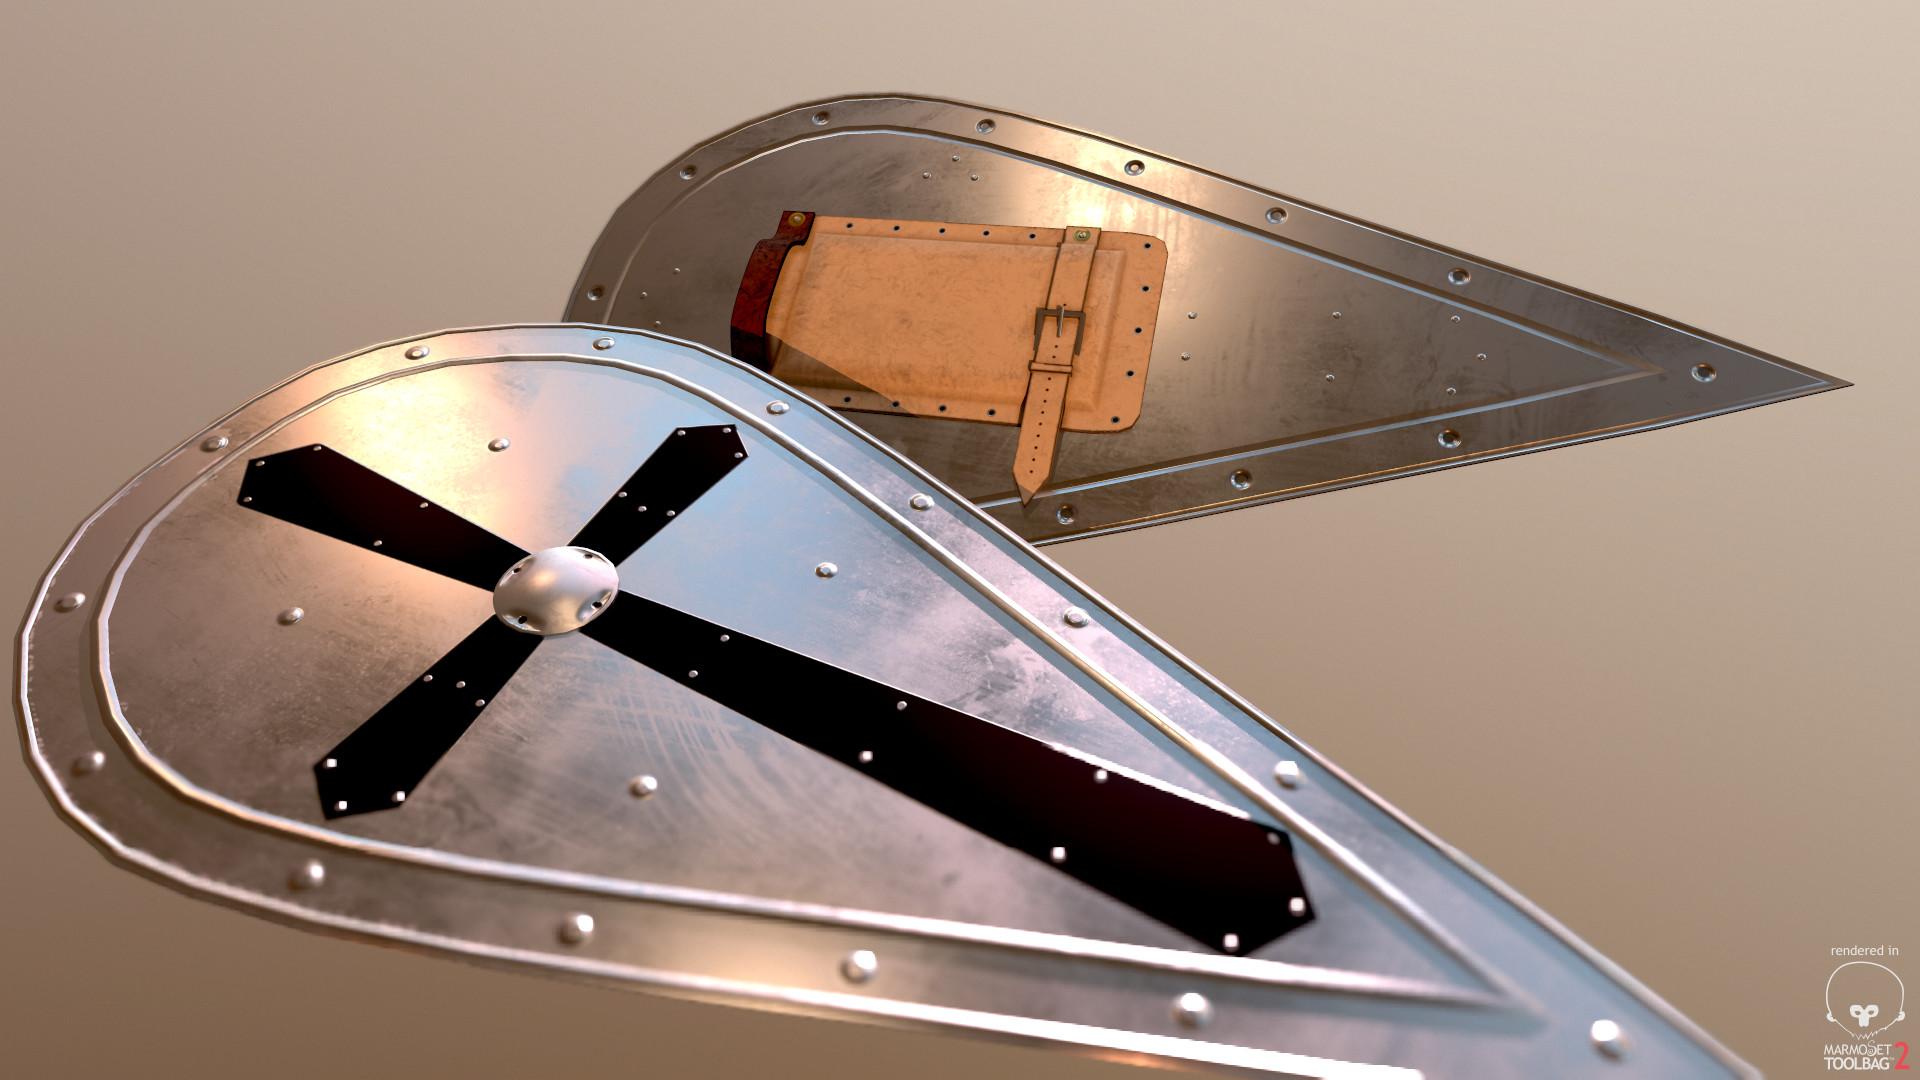 Bela csampai iron norman shield preview mt 04